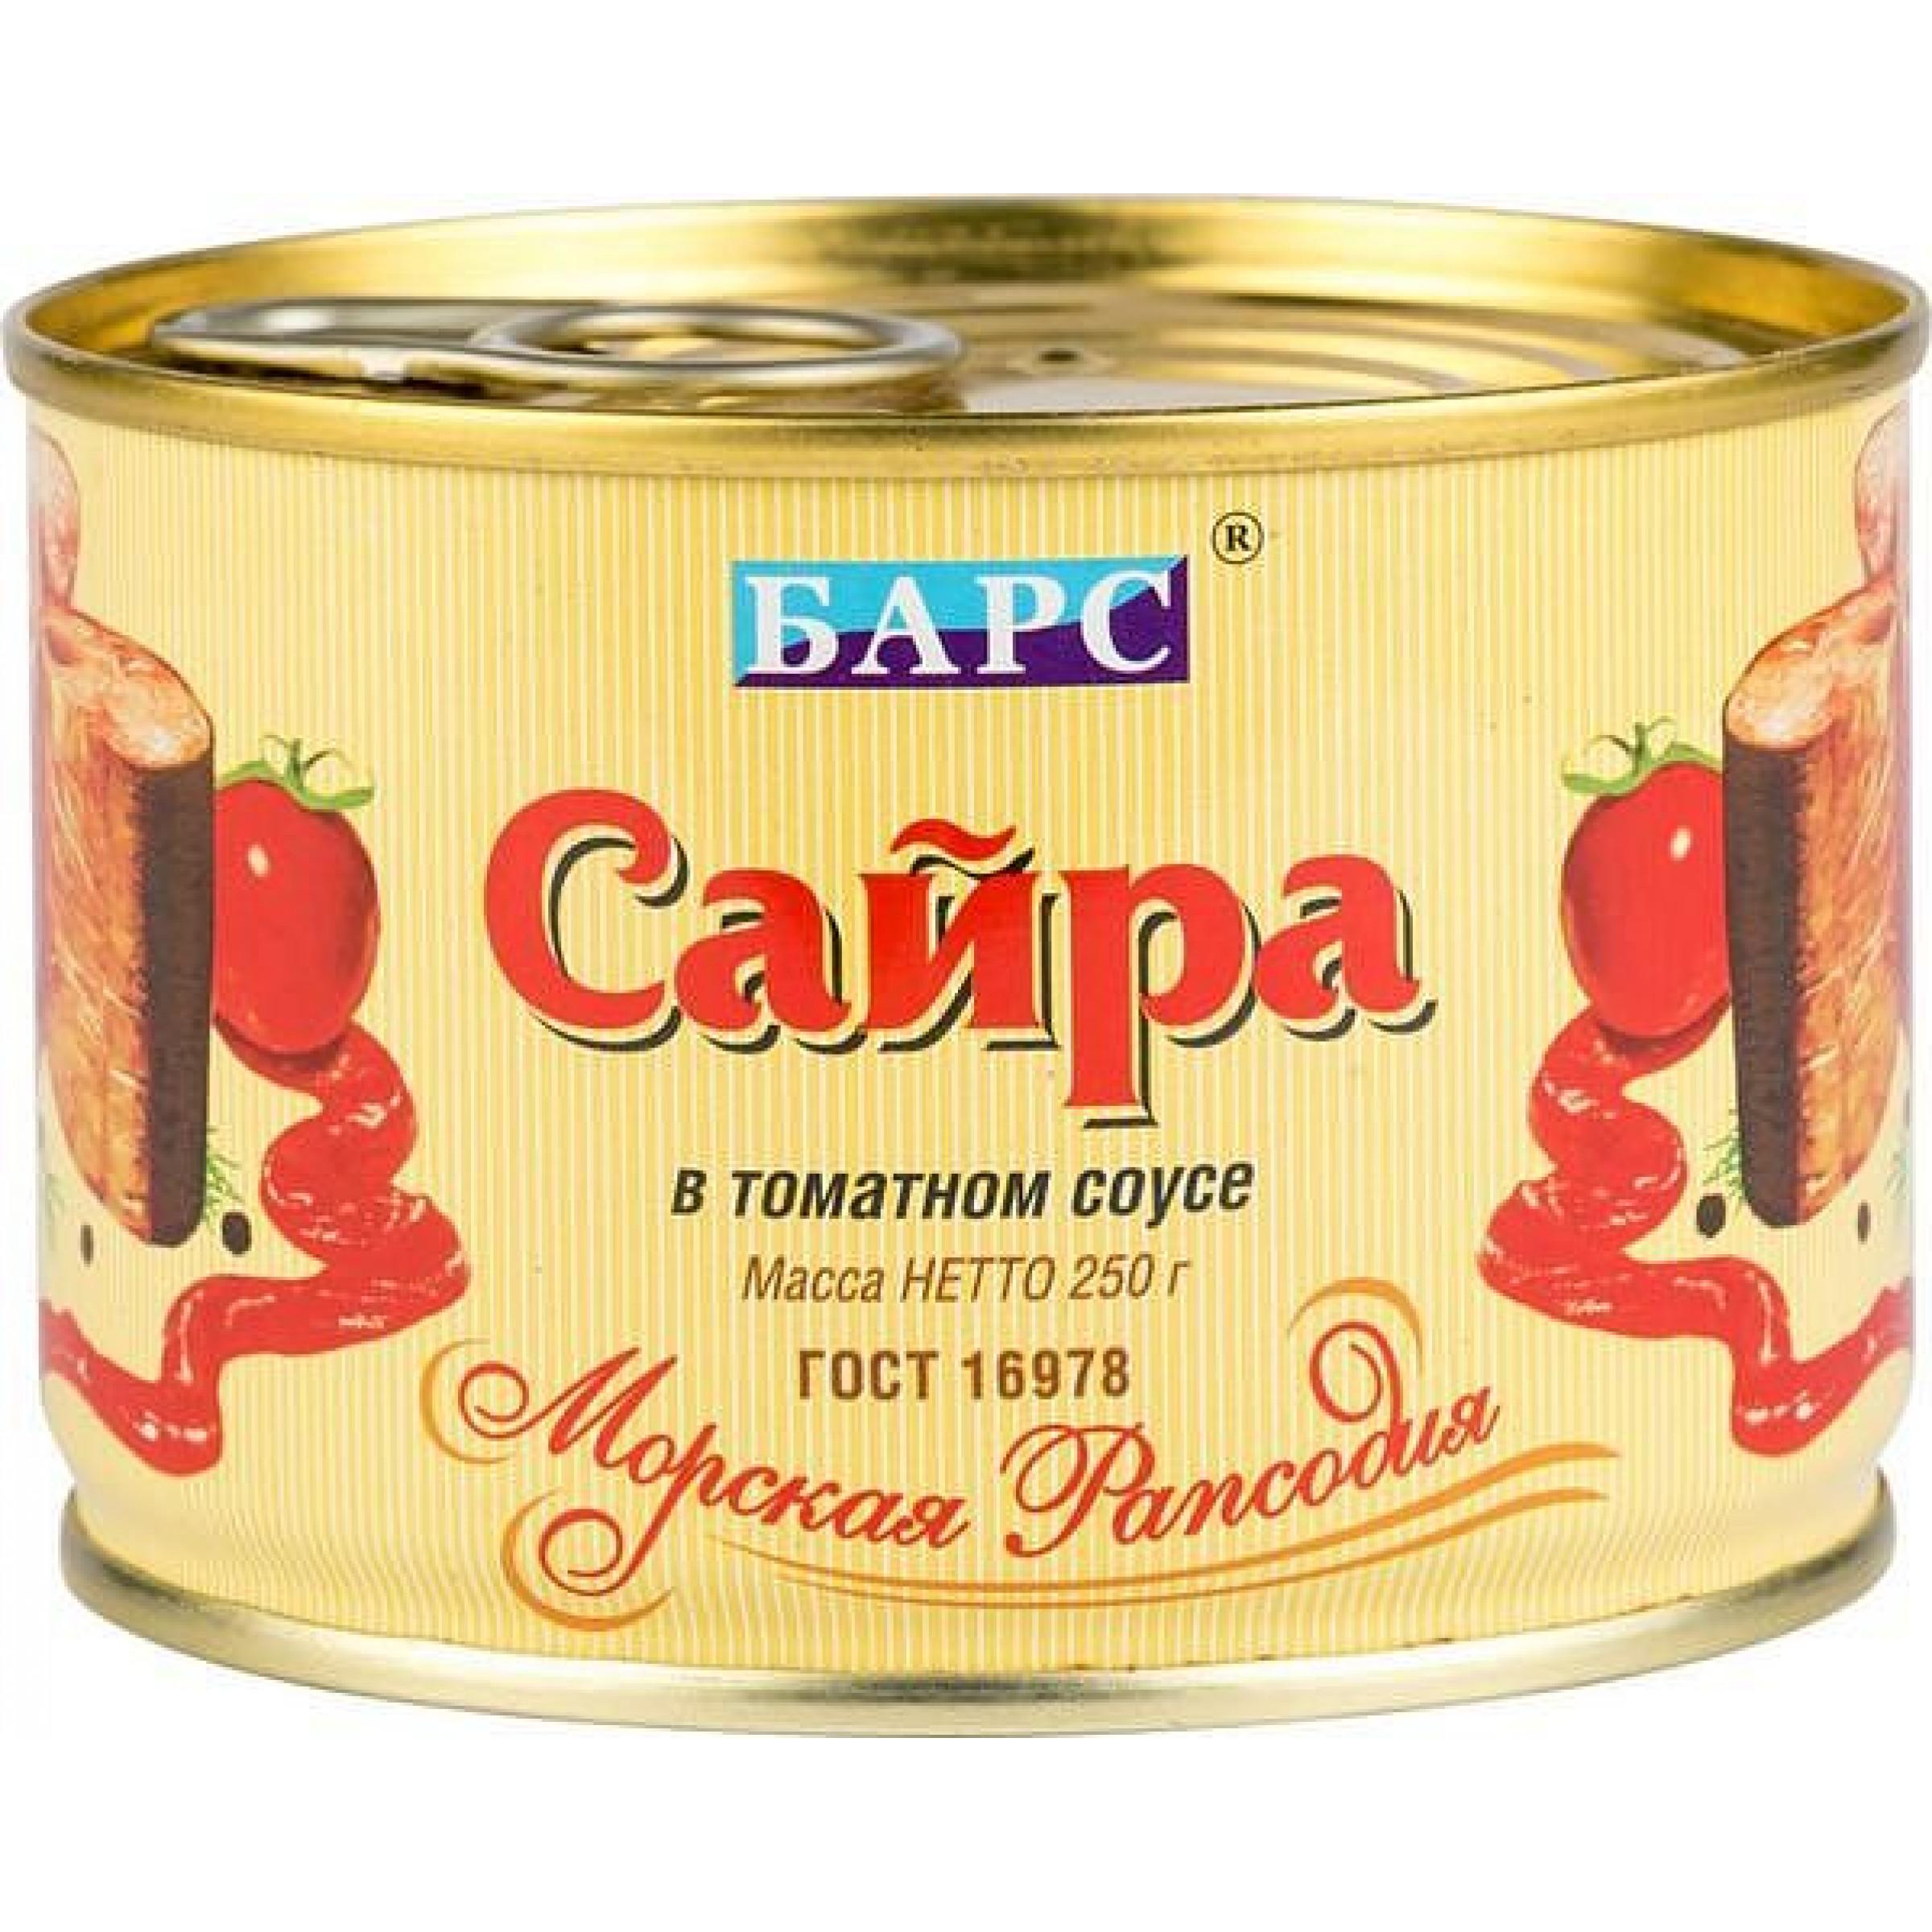 Сайра в томатном соусе Барс, 250 гр